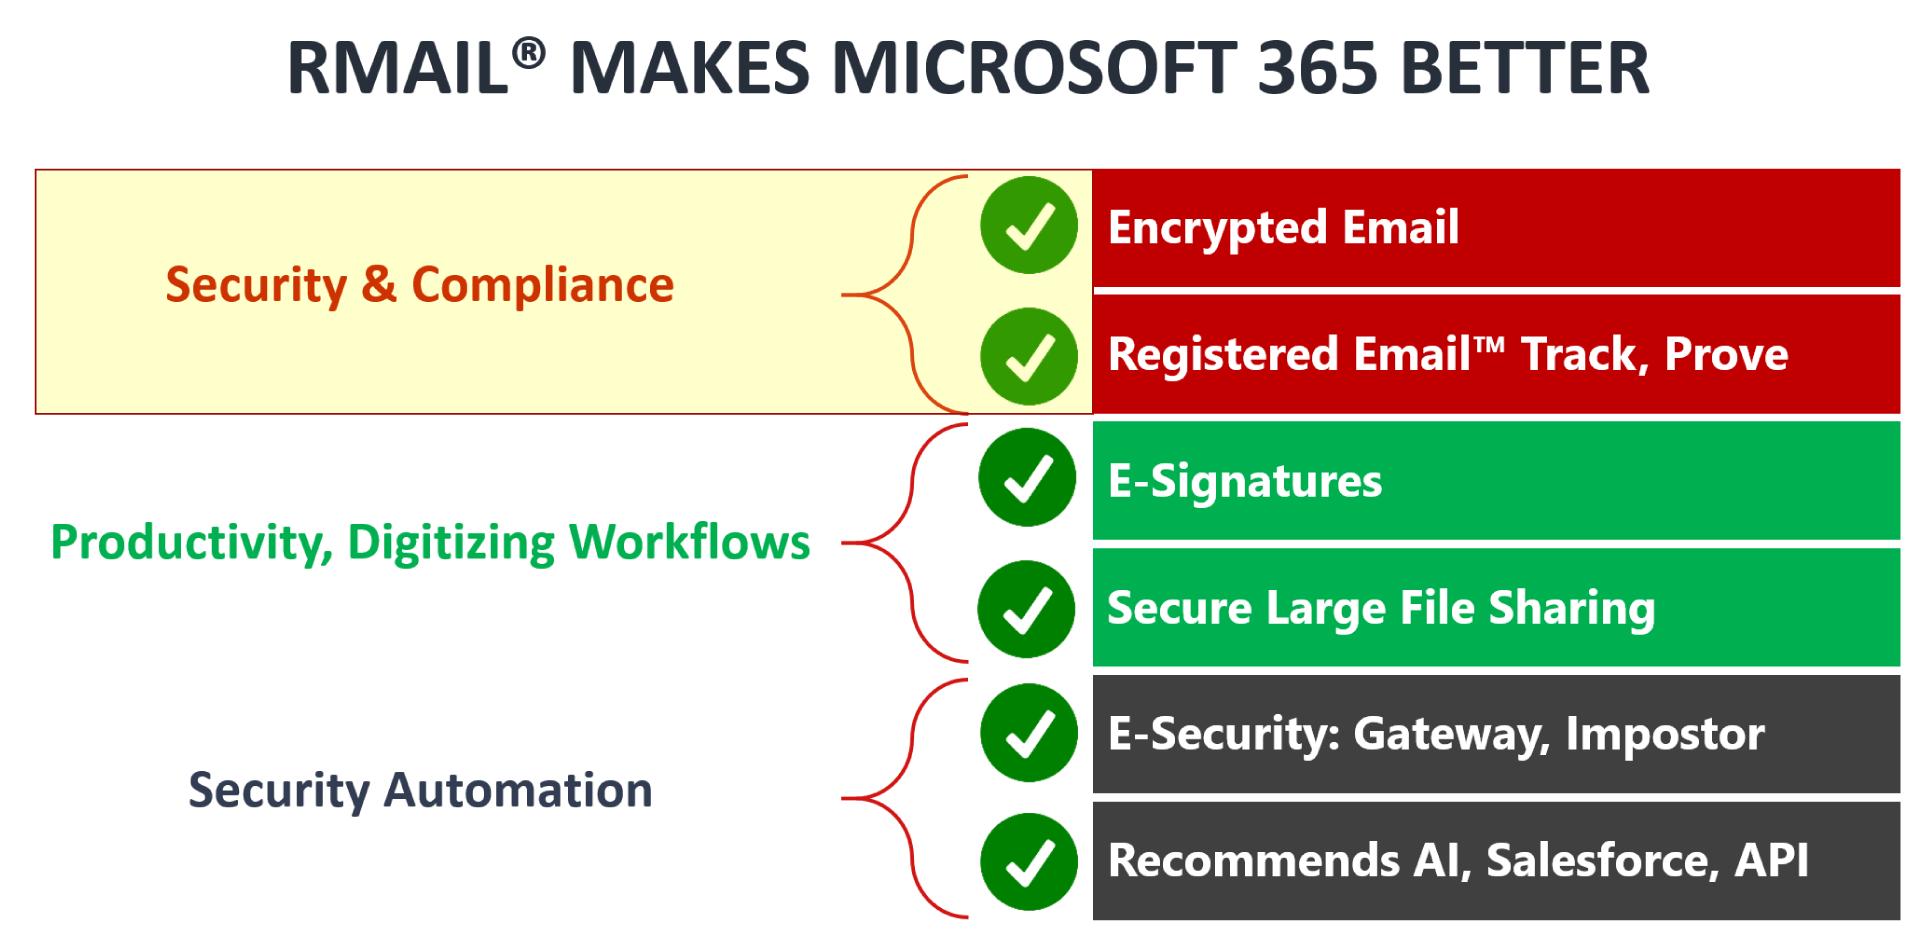 RMail Makes Microsoft 365 Better